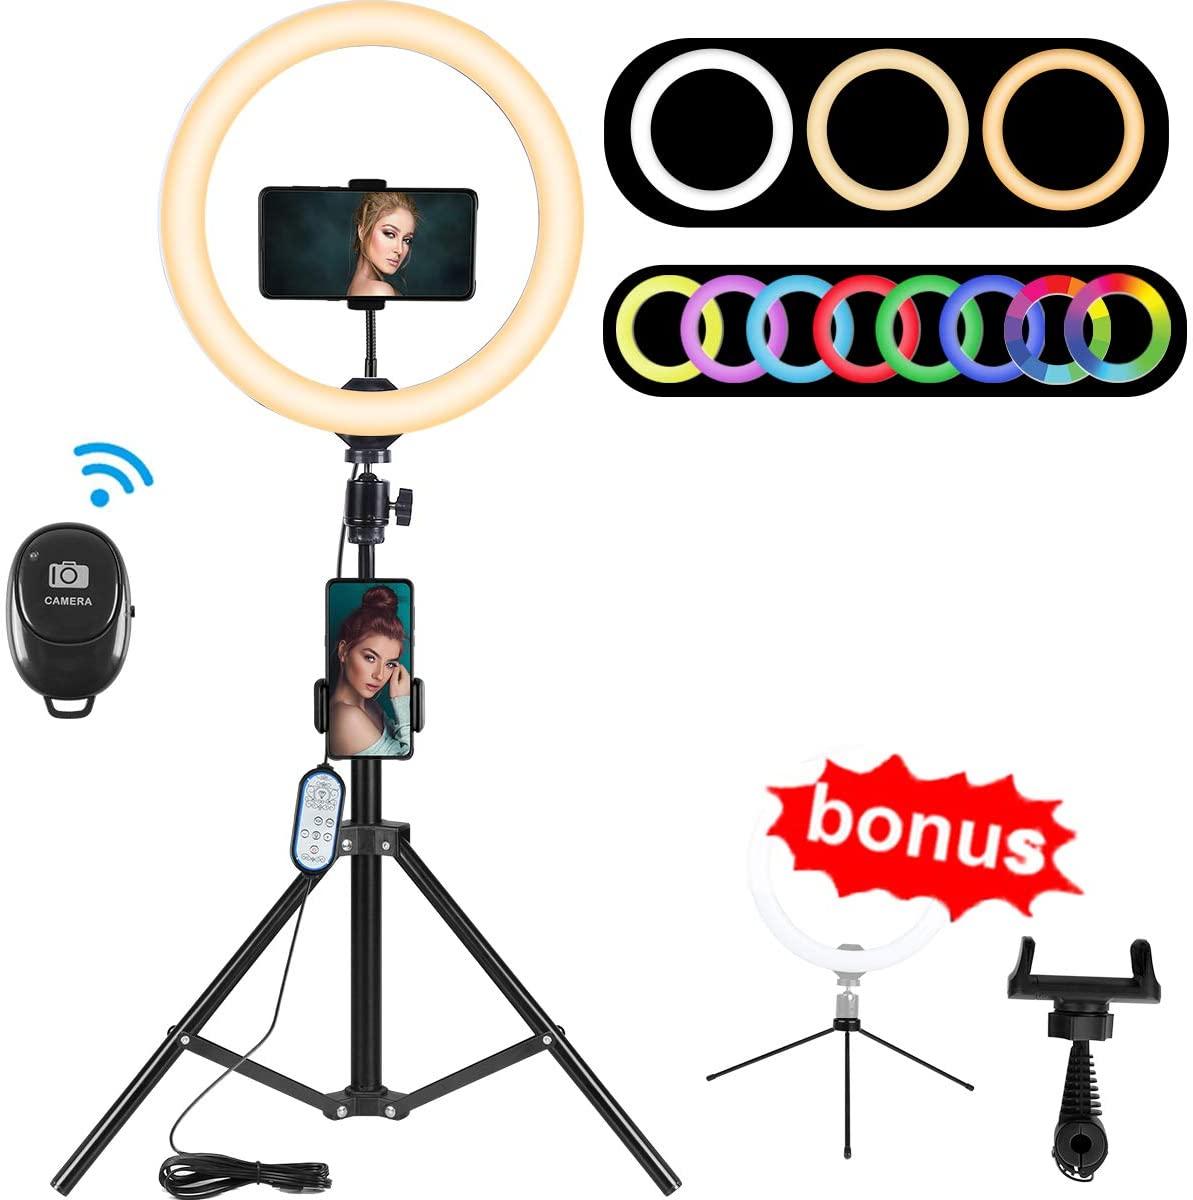 "10.2"" RGB Selfie Ring Light"